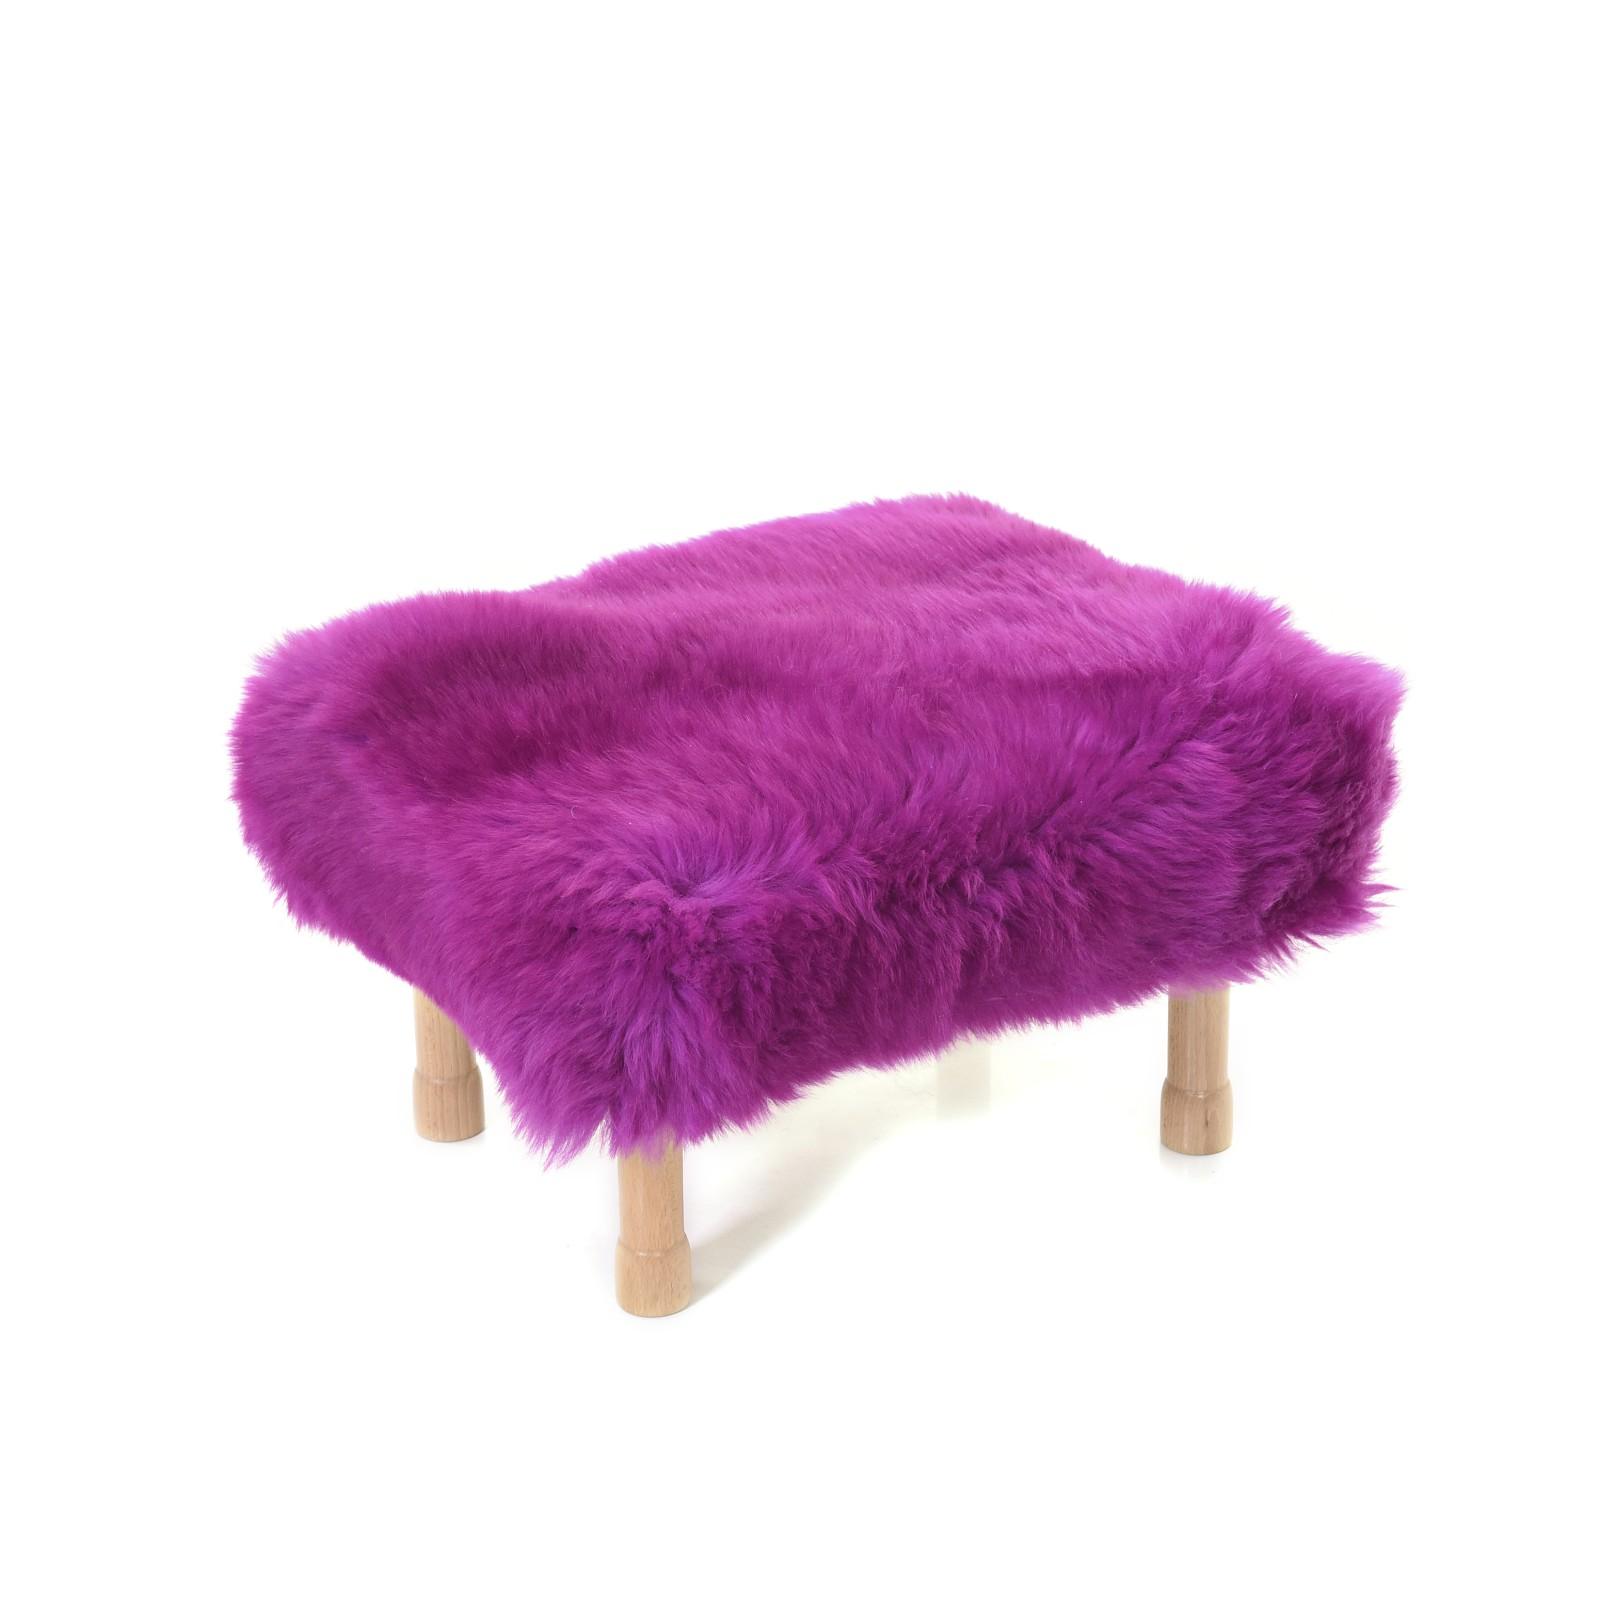 Dilys Sheepskin Footstool Cerise